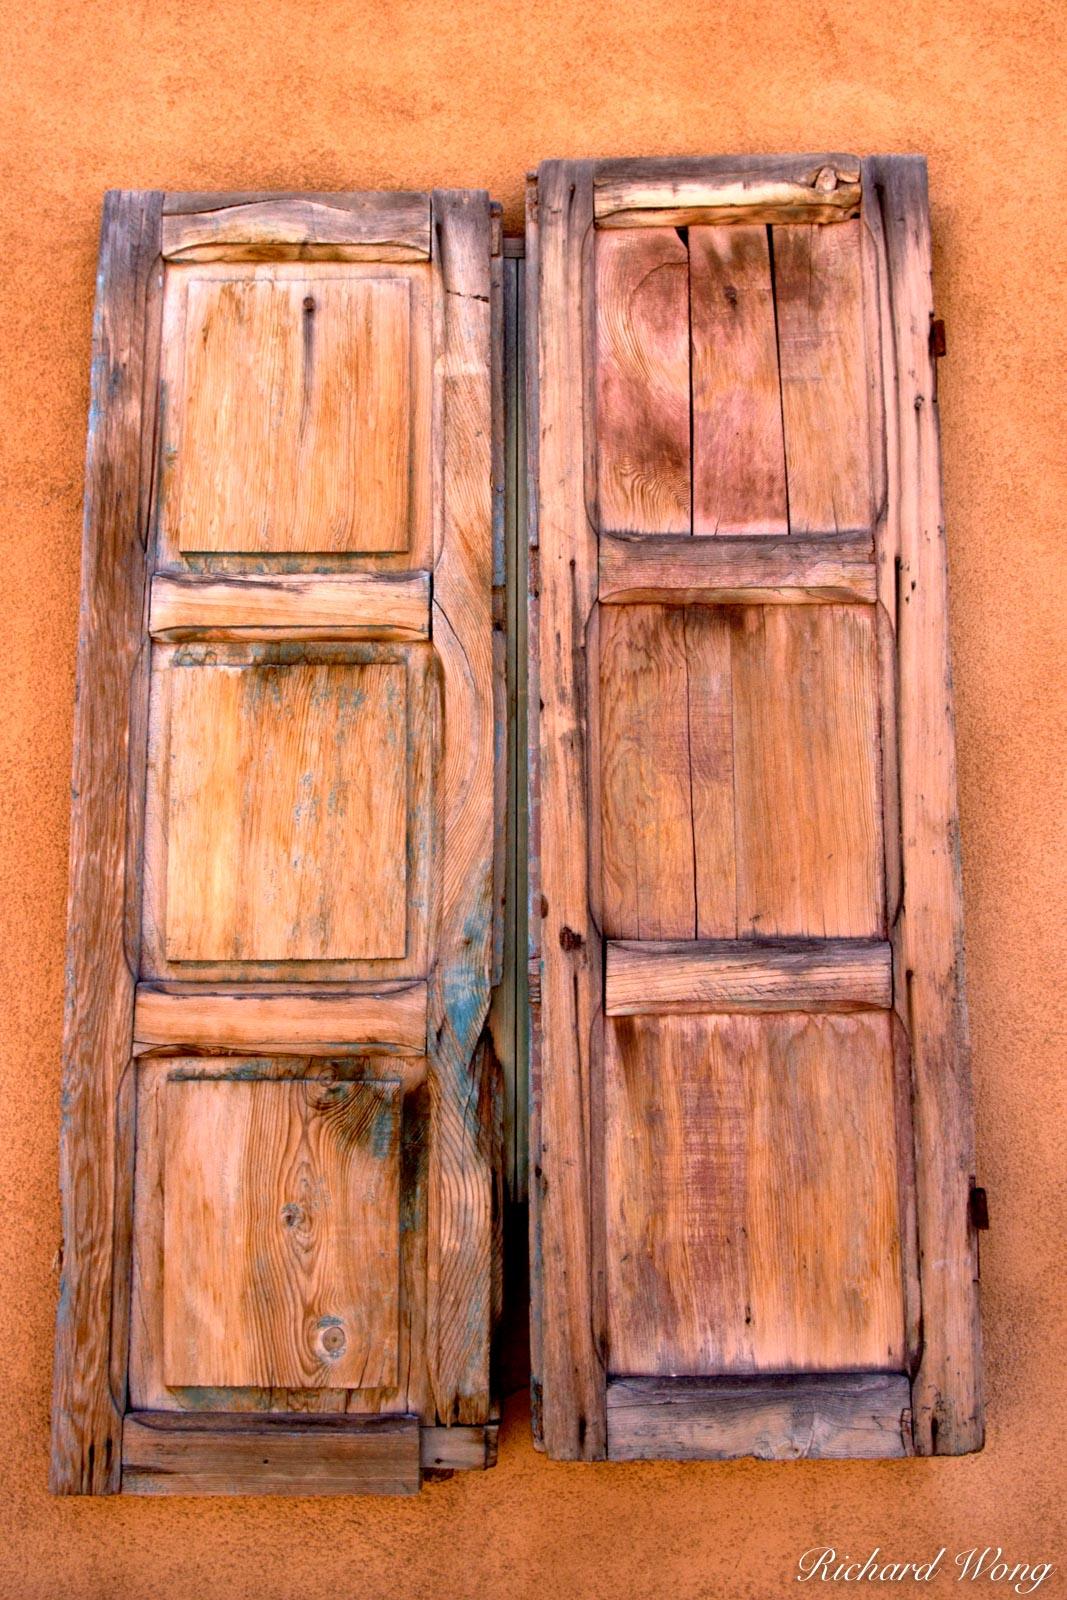 Wooden Windows Shutters along Canyon Road, Santa Fe, New Mexico, photo, photo